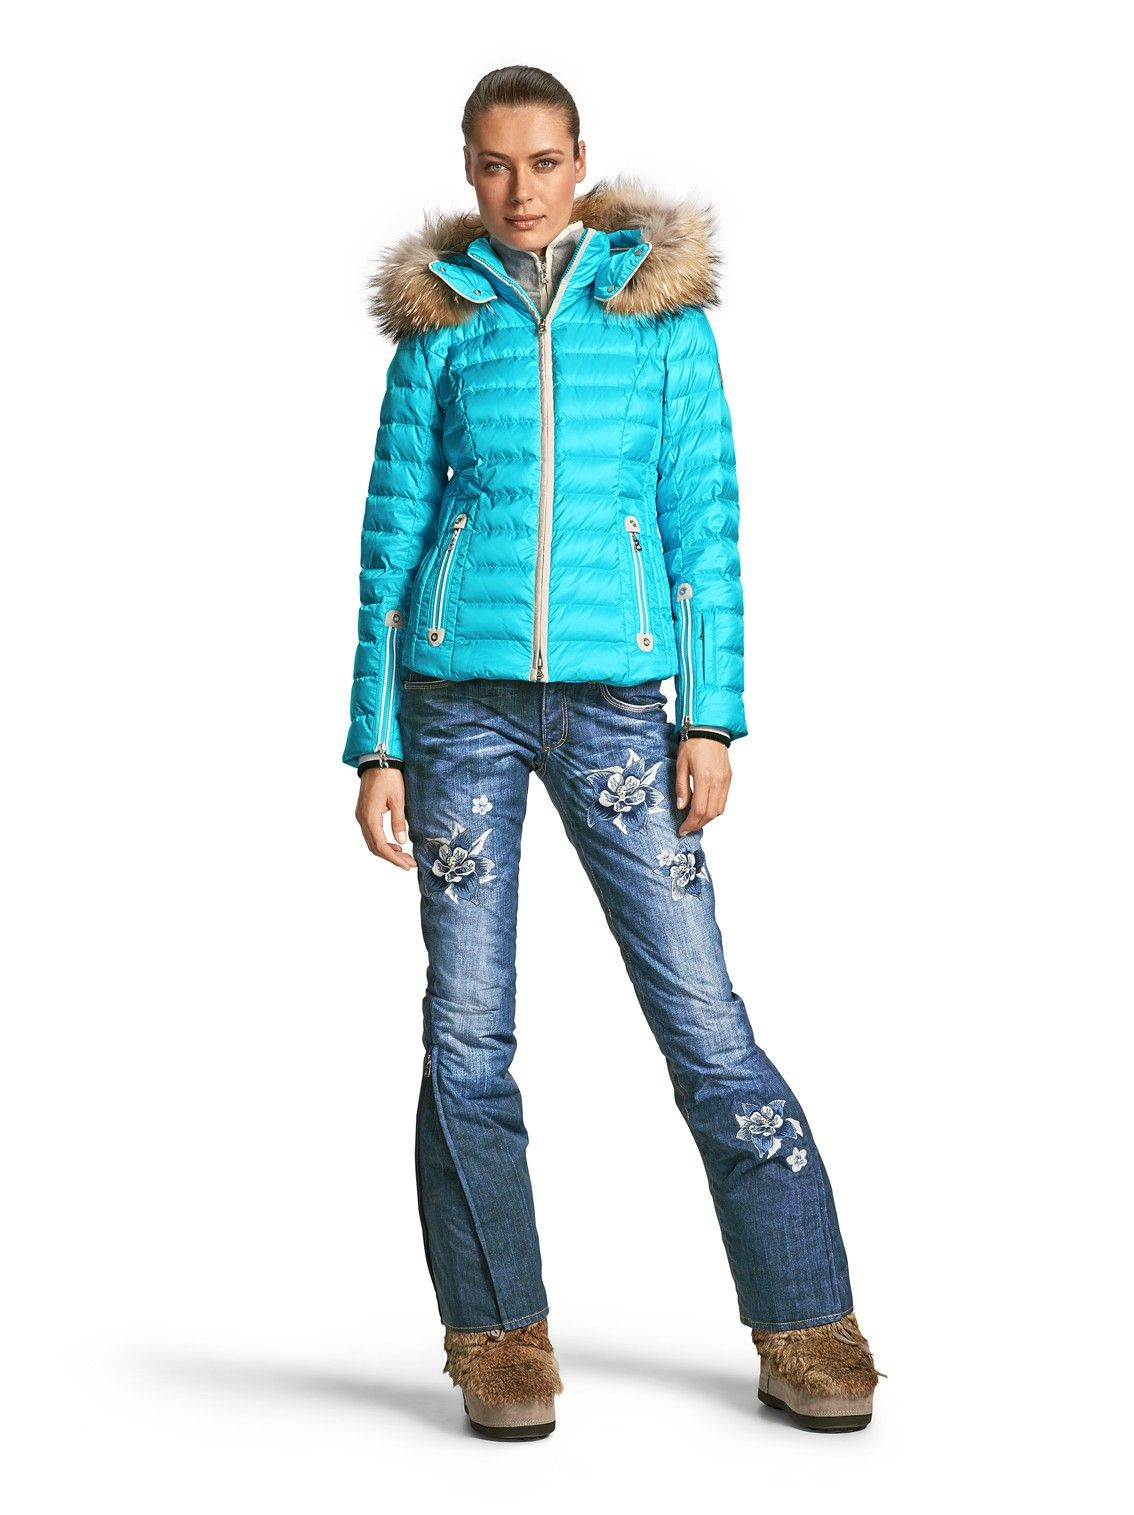 Down Jacket Kylie, Medium Turquoise | Ski Clothing, Down Jackets ...